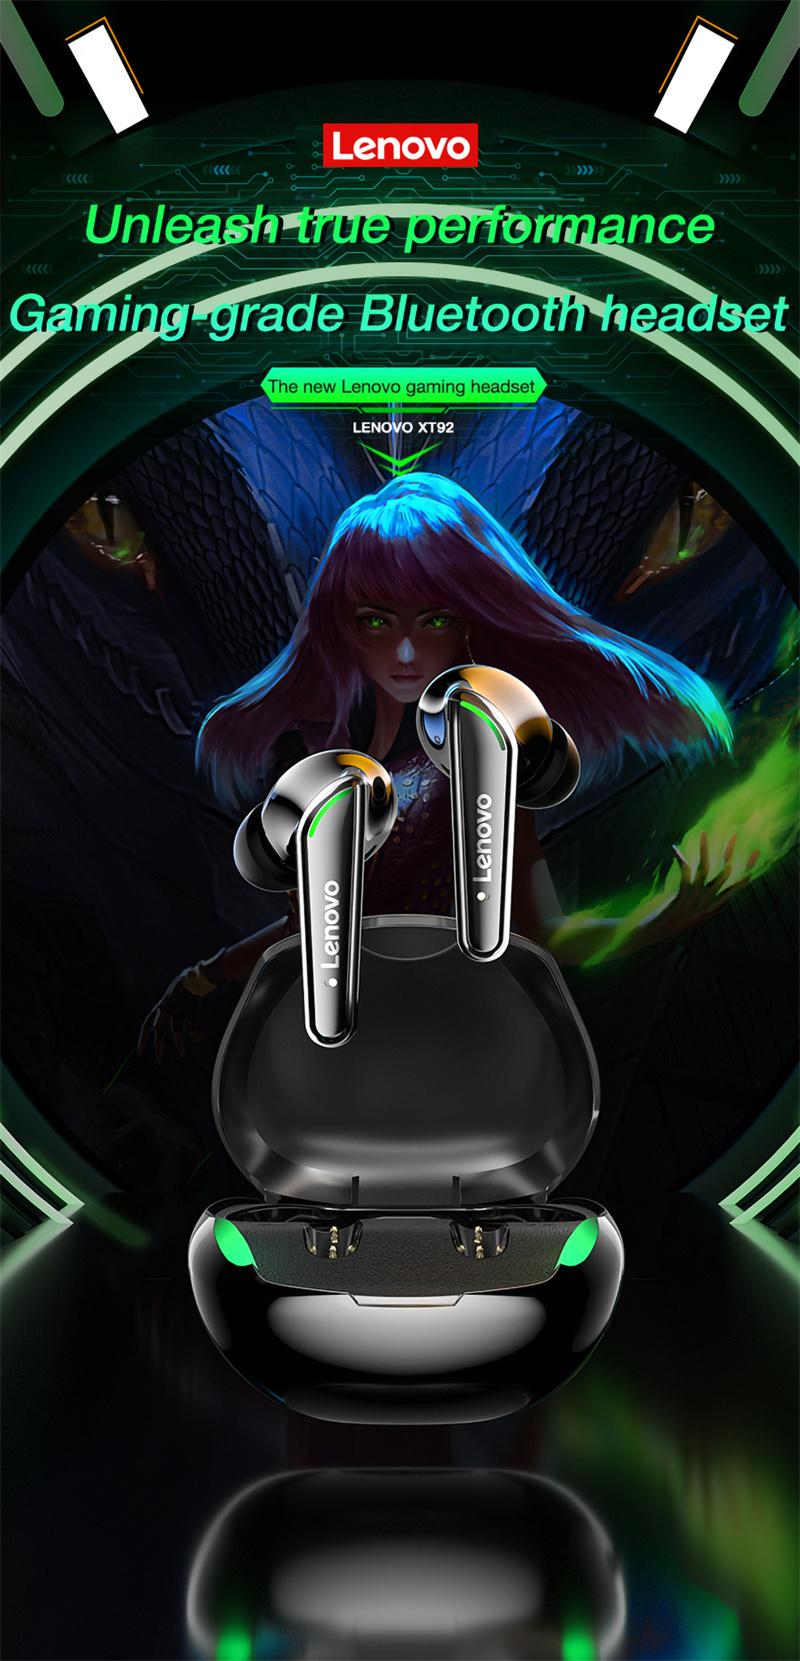 Lenovo XT92 Gaming Snake Bluetooth Earphone Wireless 9